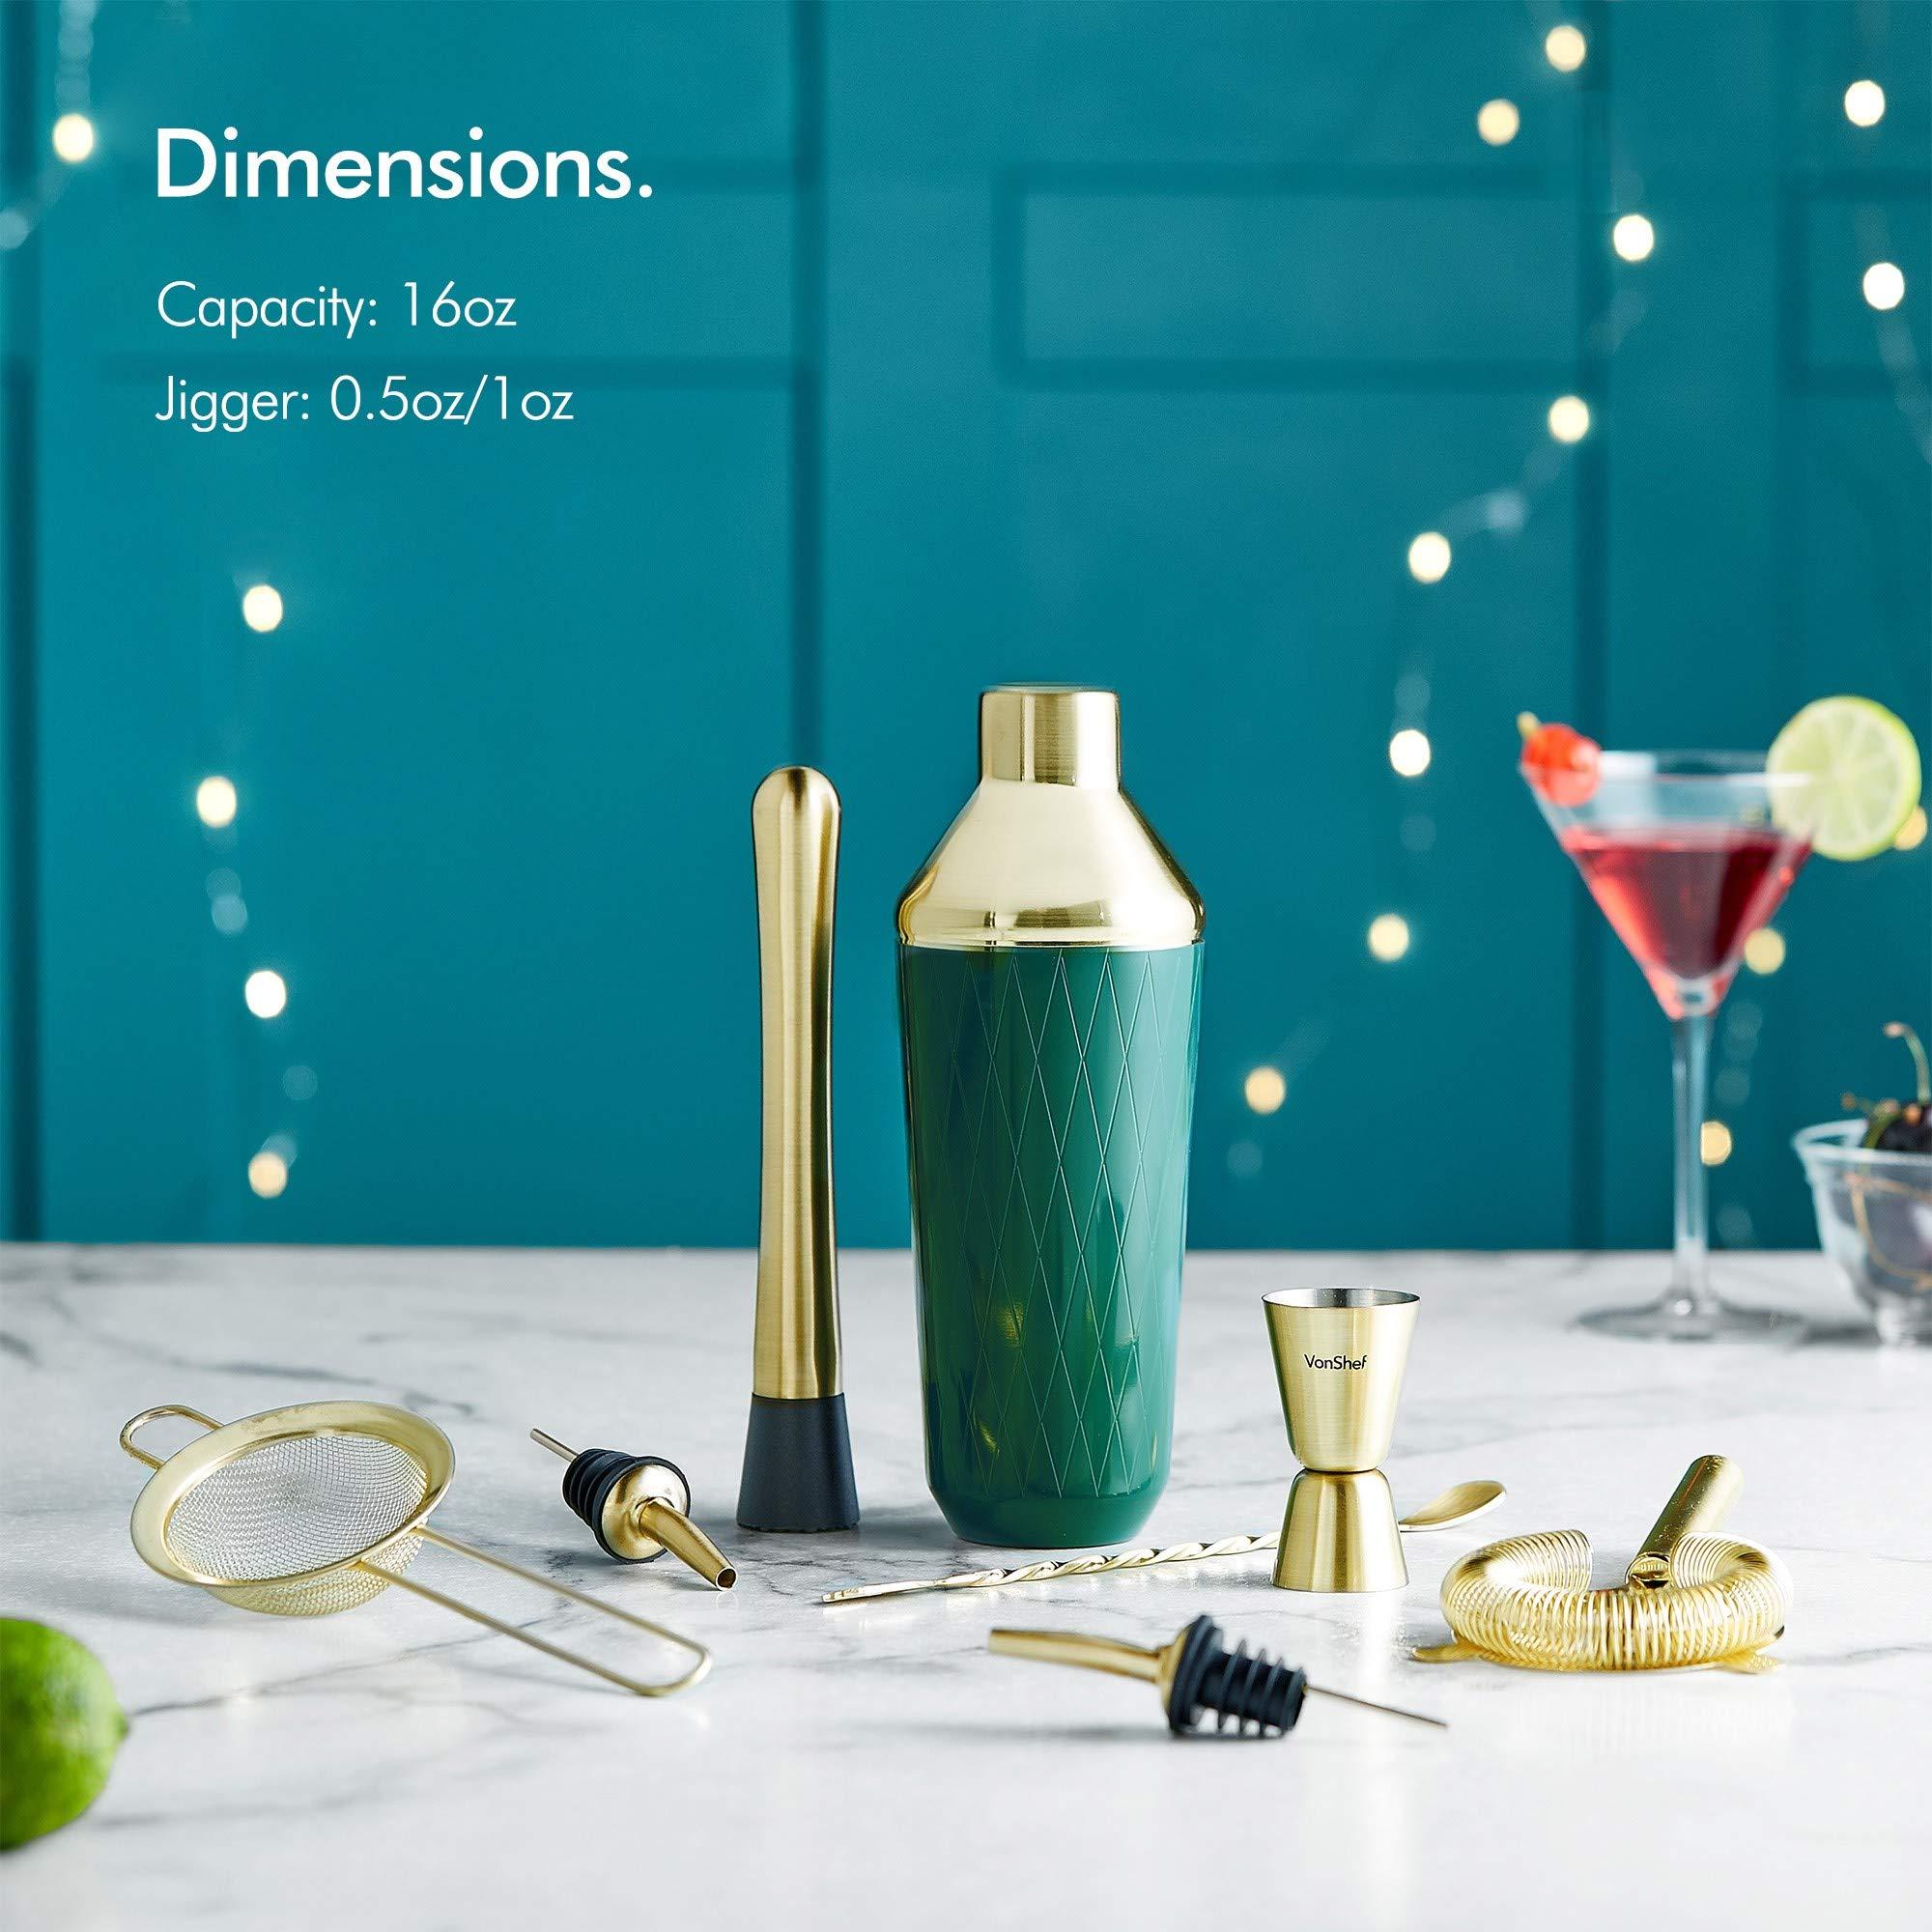 VonShef Green & Gold Cocktail Shaker Set in Gift Box with 16oz Shaker, Muddler, Bar Spoon, Jigger, Hawthorne Strainer, Julep Strainer, Bottle Pourer and Recipe Book by VonShef (Image #2)